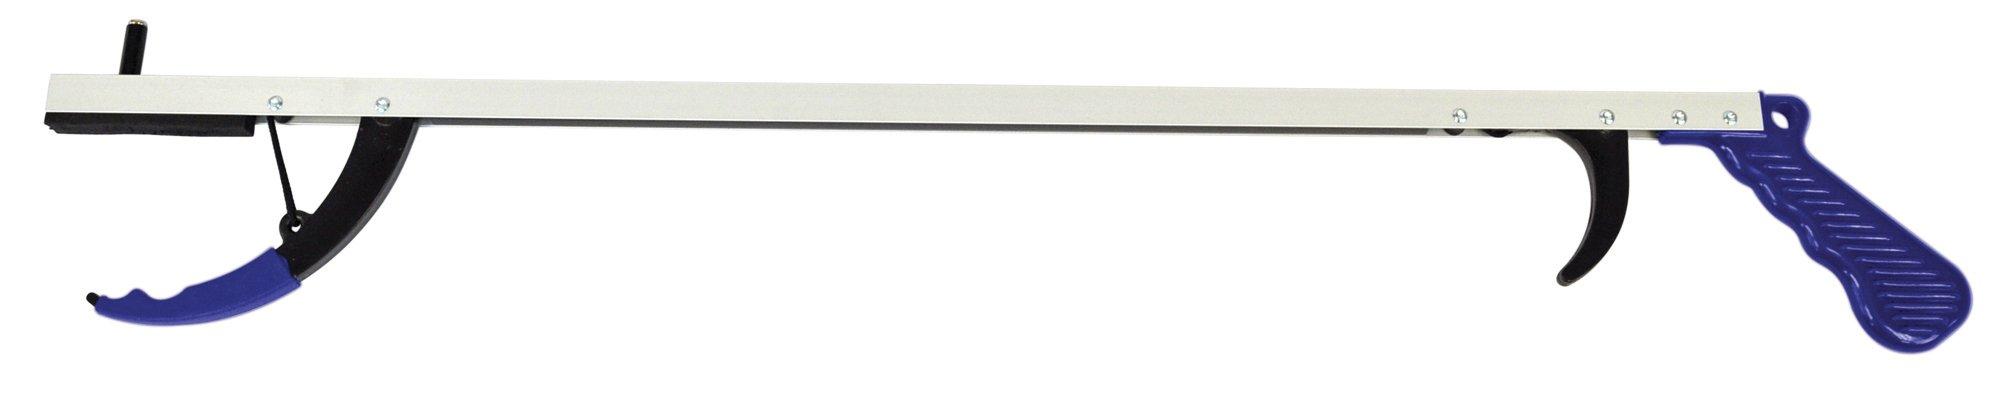 Premium Ergonomic Lightweight Reacher Grabber Tool Mobility Aid - 26 Inch